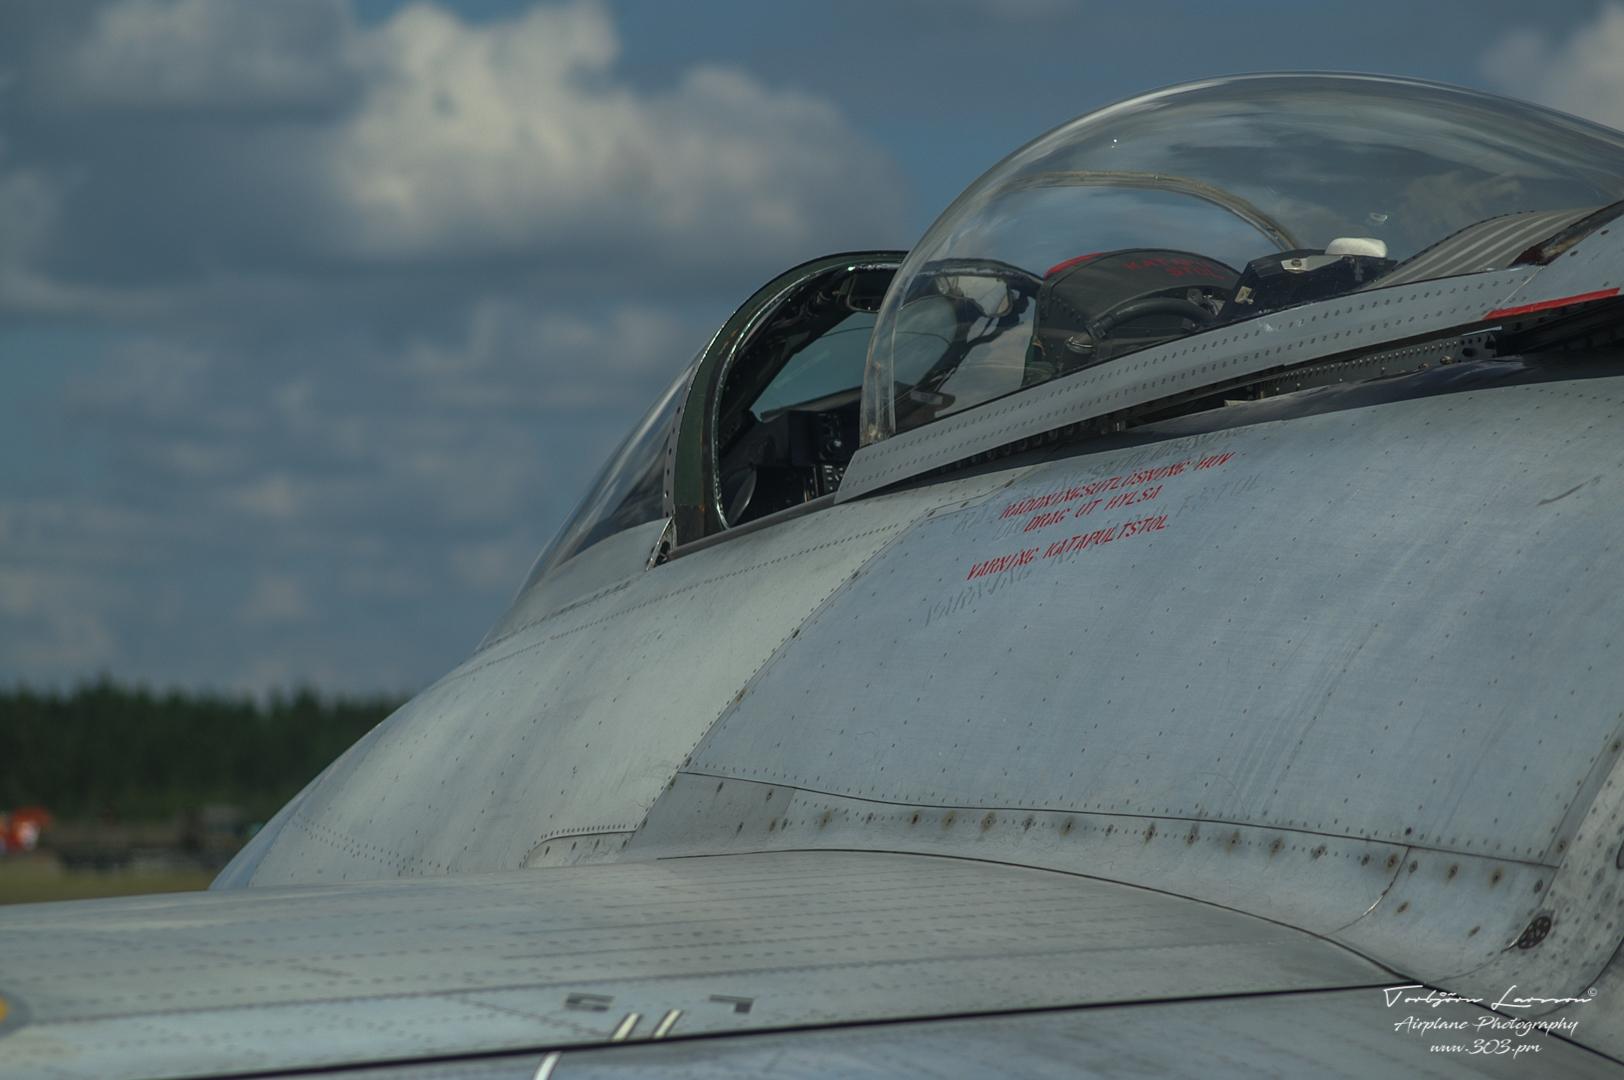 PICT9178-Saab J-29 Tunnan